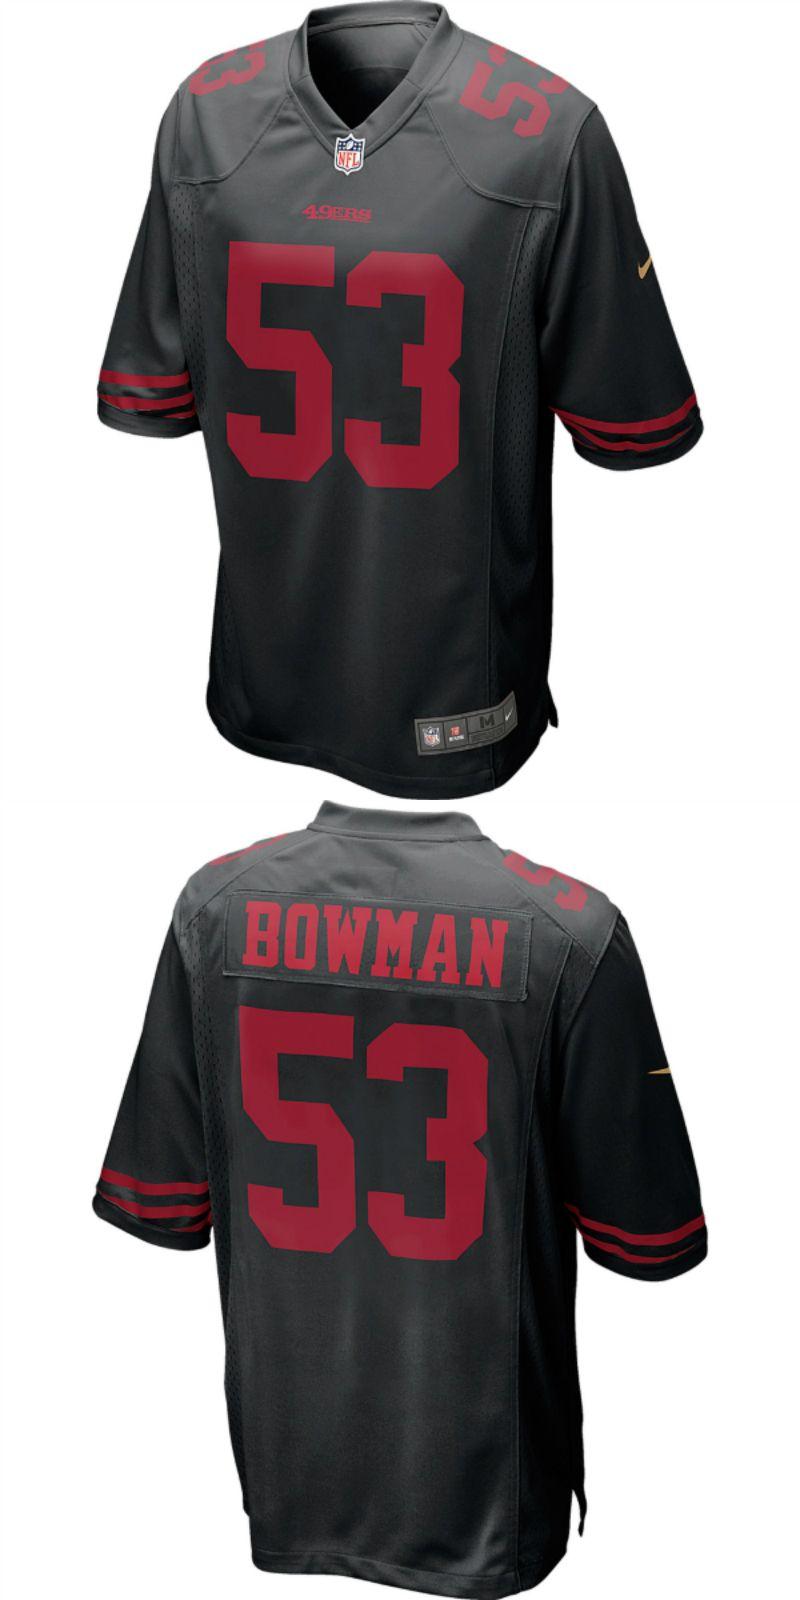 37e97b7c UP TO 70% OFF. NaVorro Bowman San Francisco 49ers Nike Alternate ...